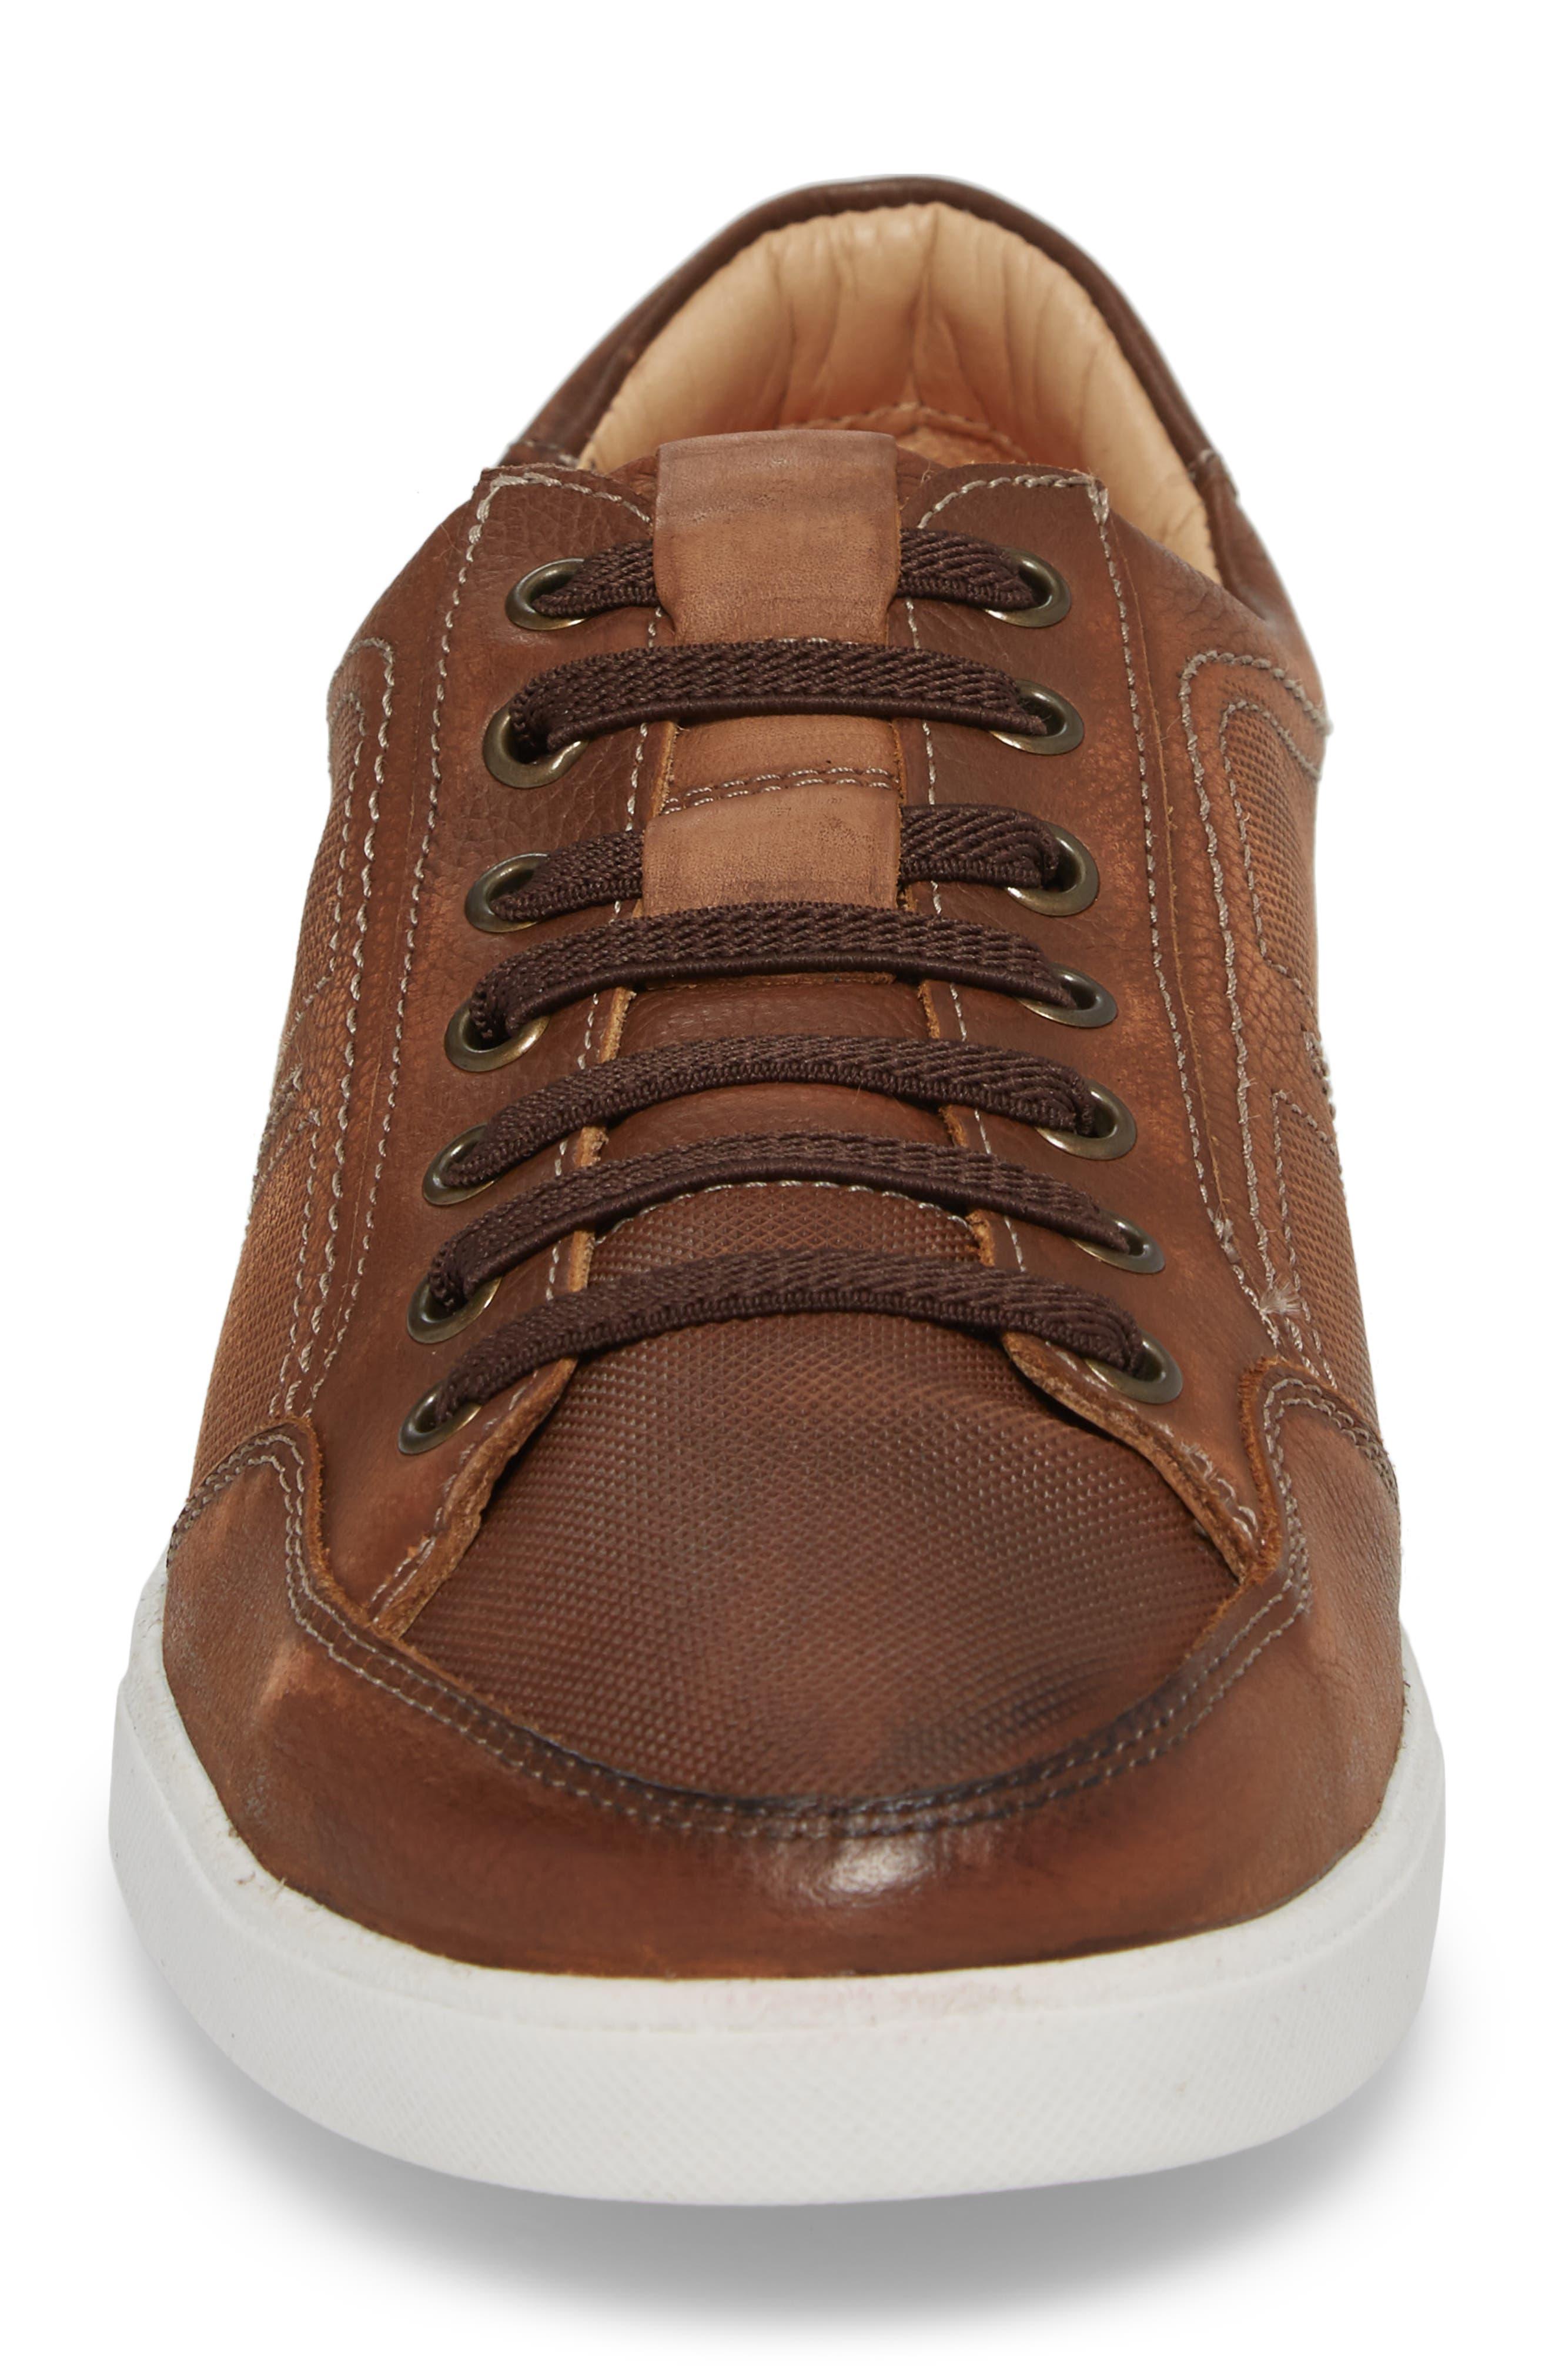 Quinton Textured Low Top Sneaker,                             Alternate thumbnail 4, color,                             Tan Leather